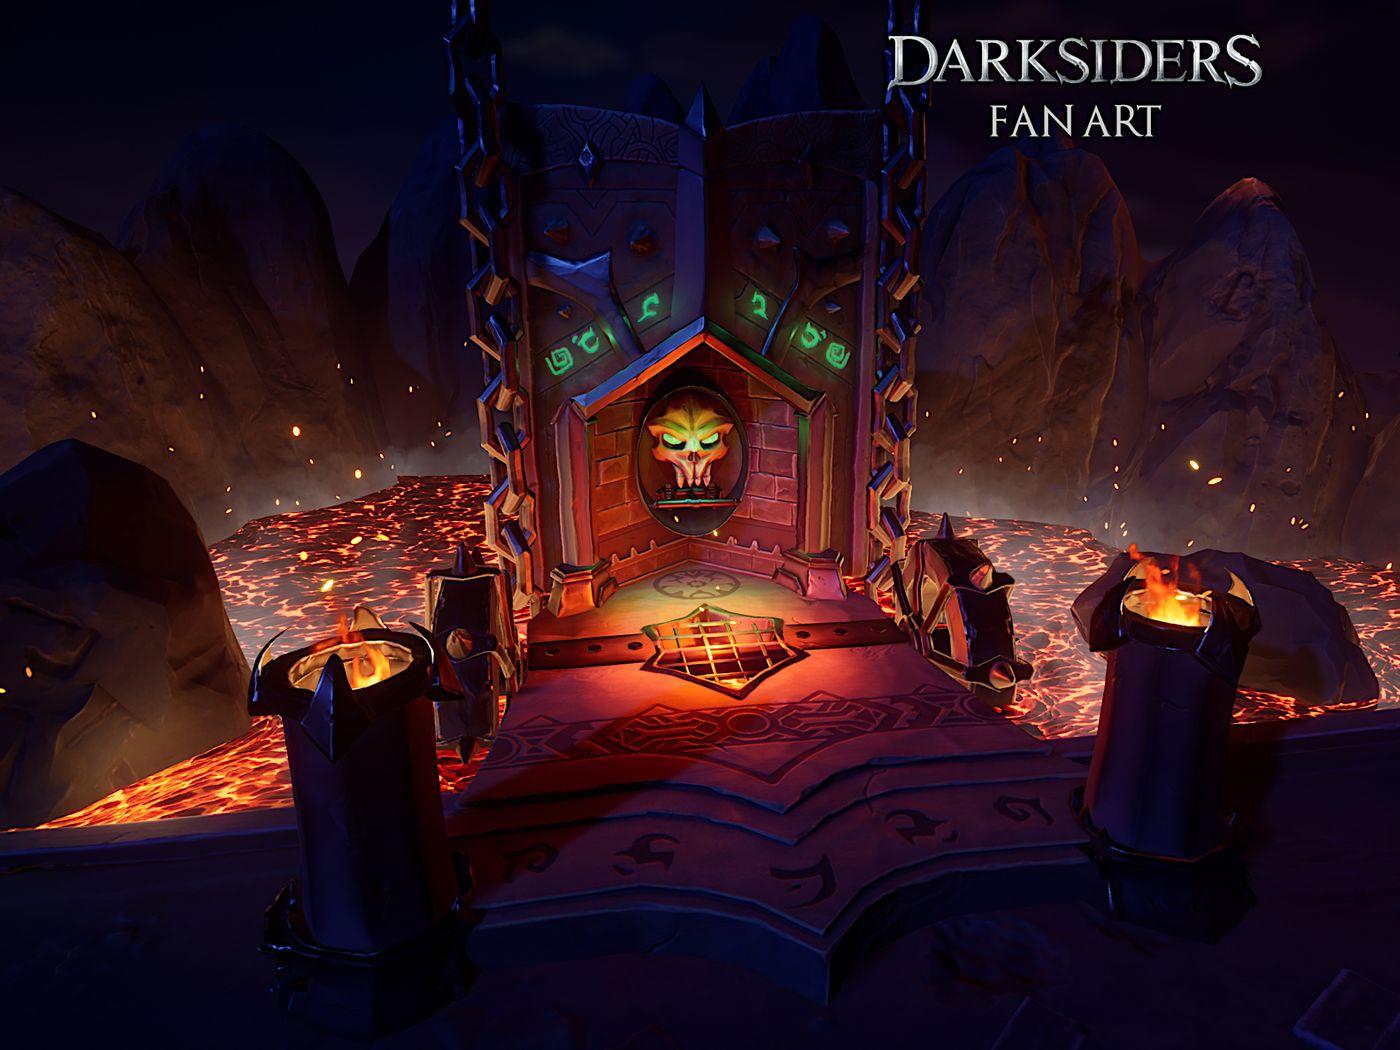 Darksiders Fan Art and Vampire House